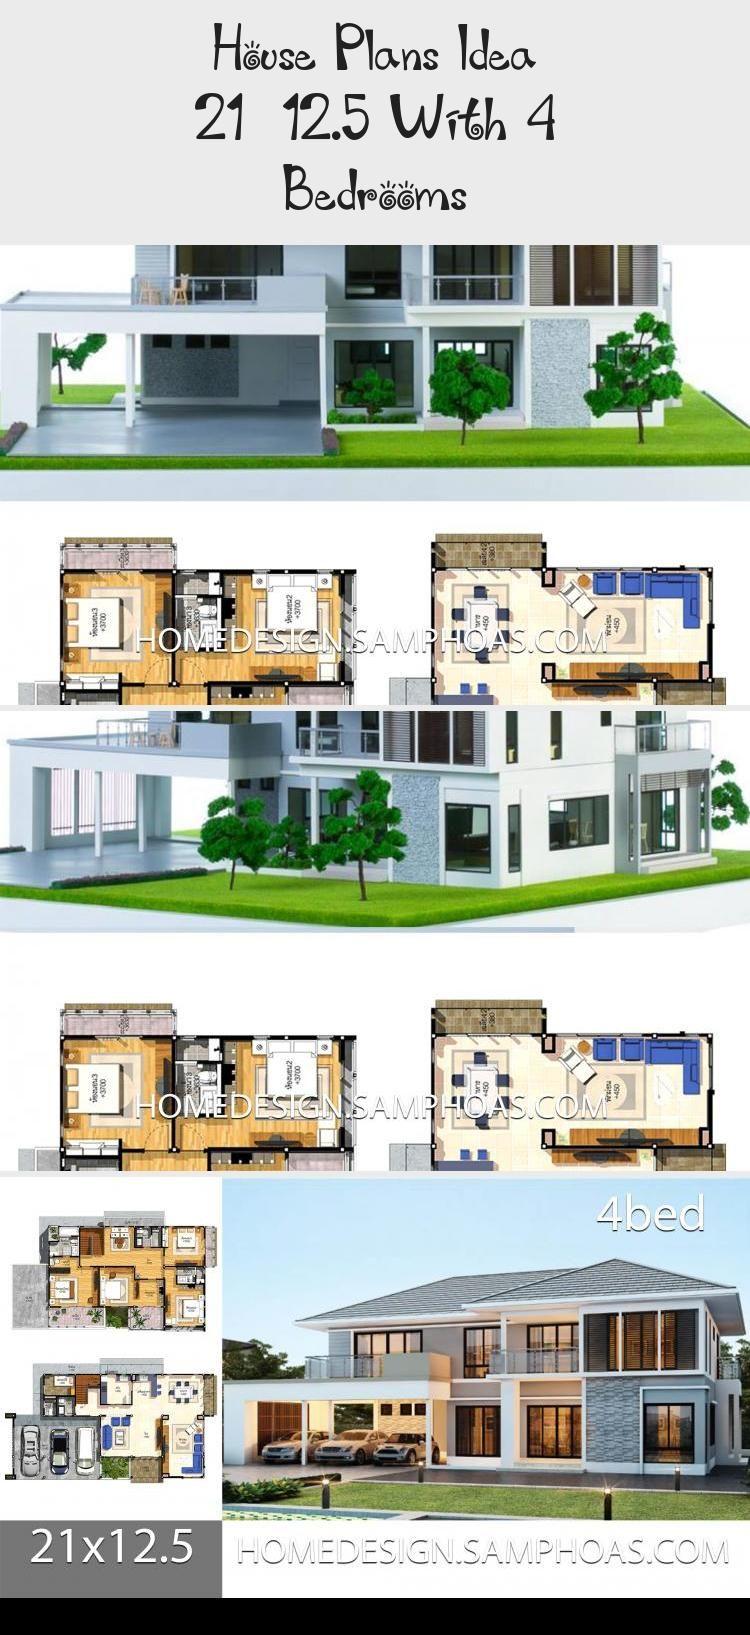 House Plans Idea 21x12 5 With 4 Bedrooms Home Ideassearch Floorplanstiny Bathroomfloorplans Floorplanscr House Plans Cottage Floor Plans Condo Floor Plans